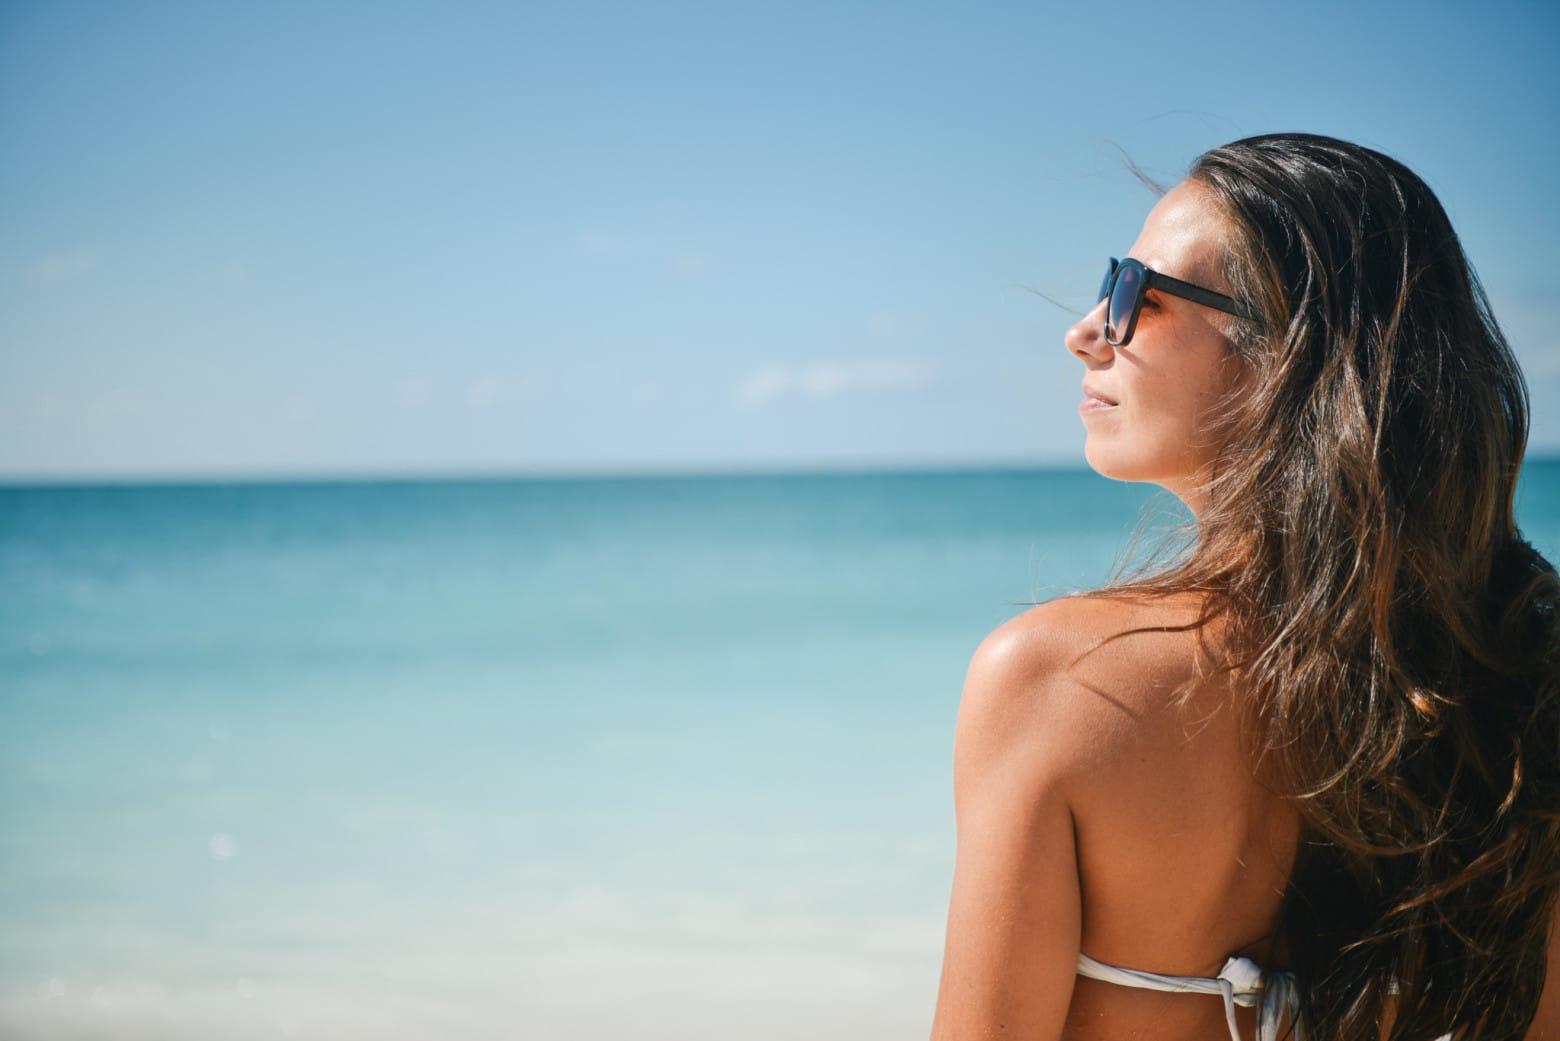 lady enjoying the beach